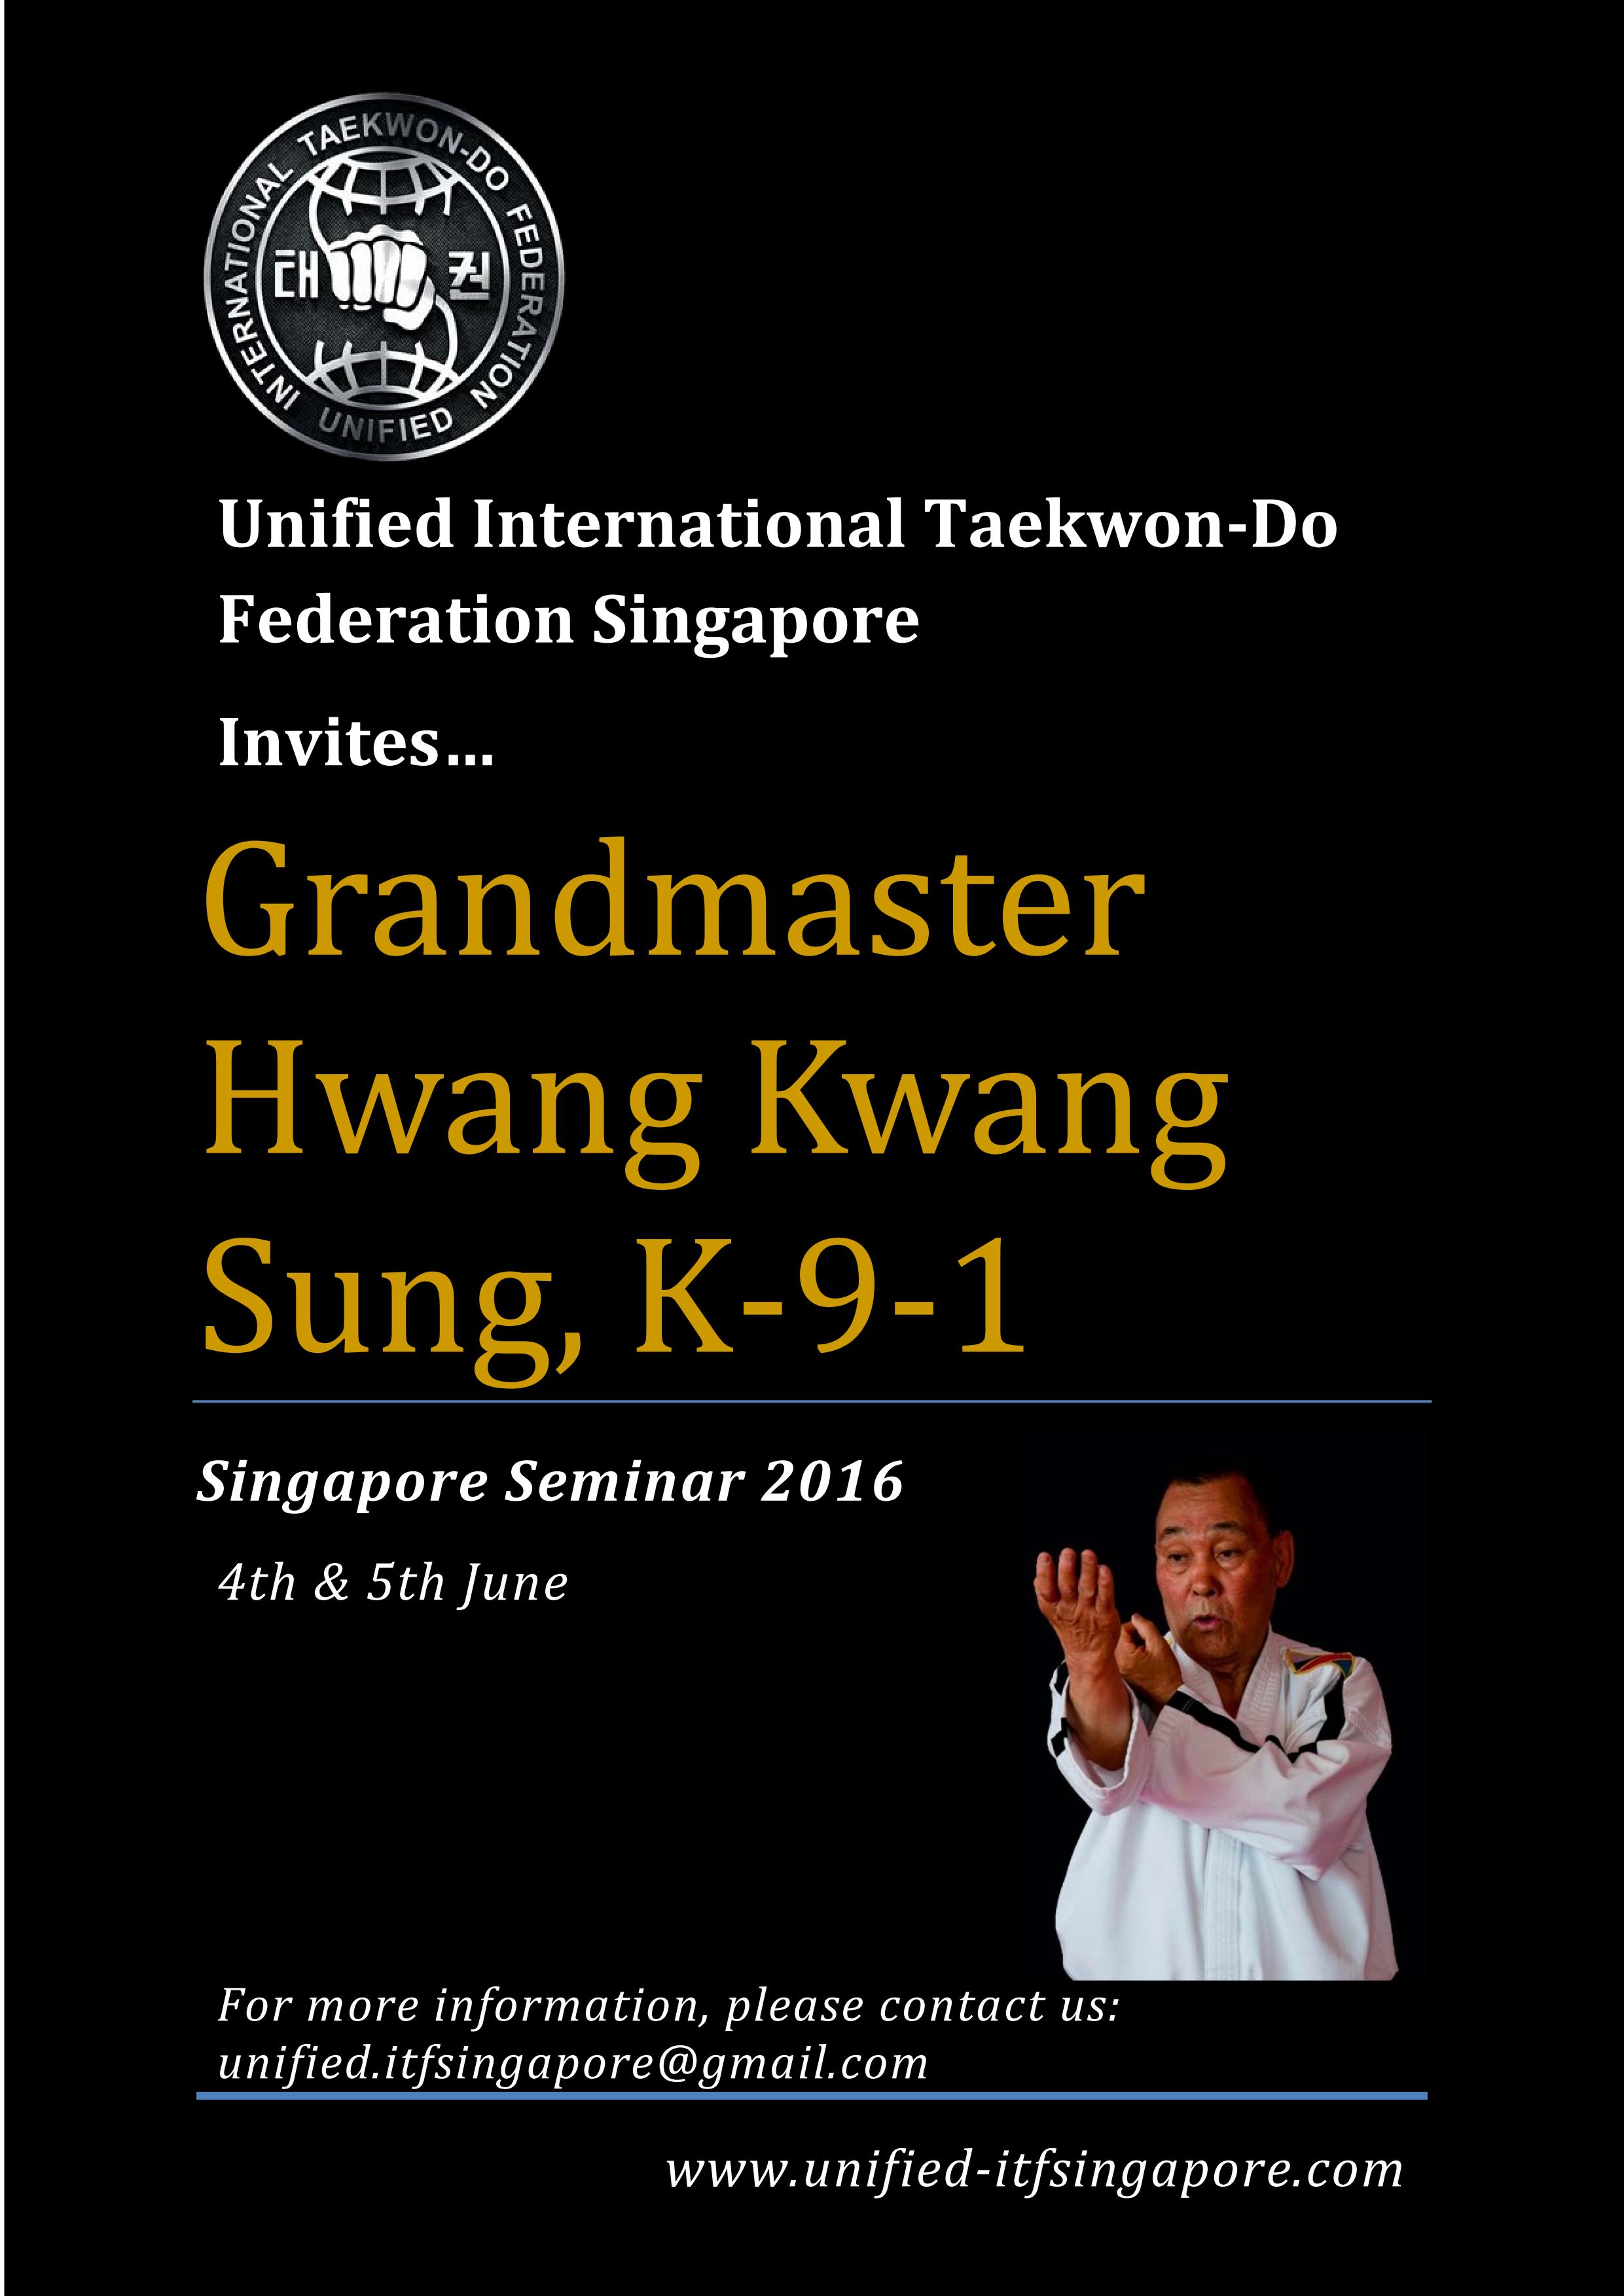 Singapore Taekwon-Do Seminar 2016